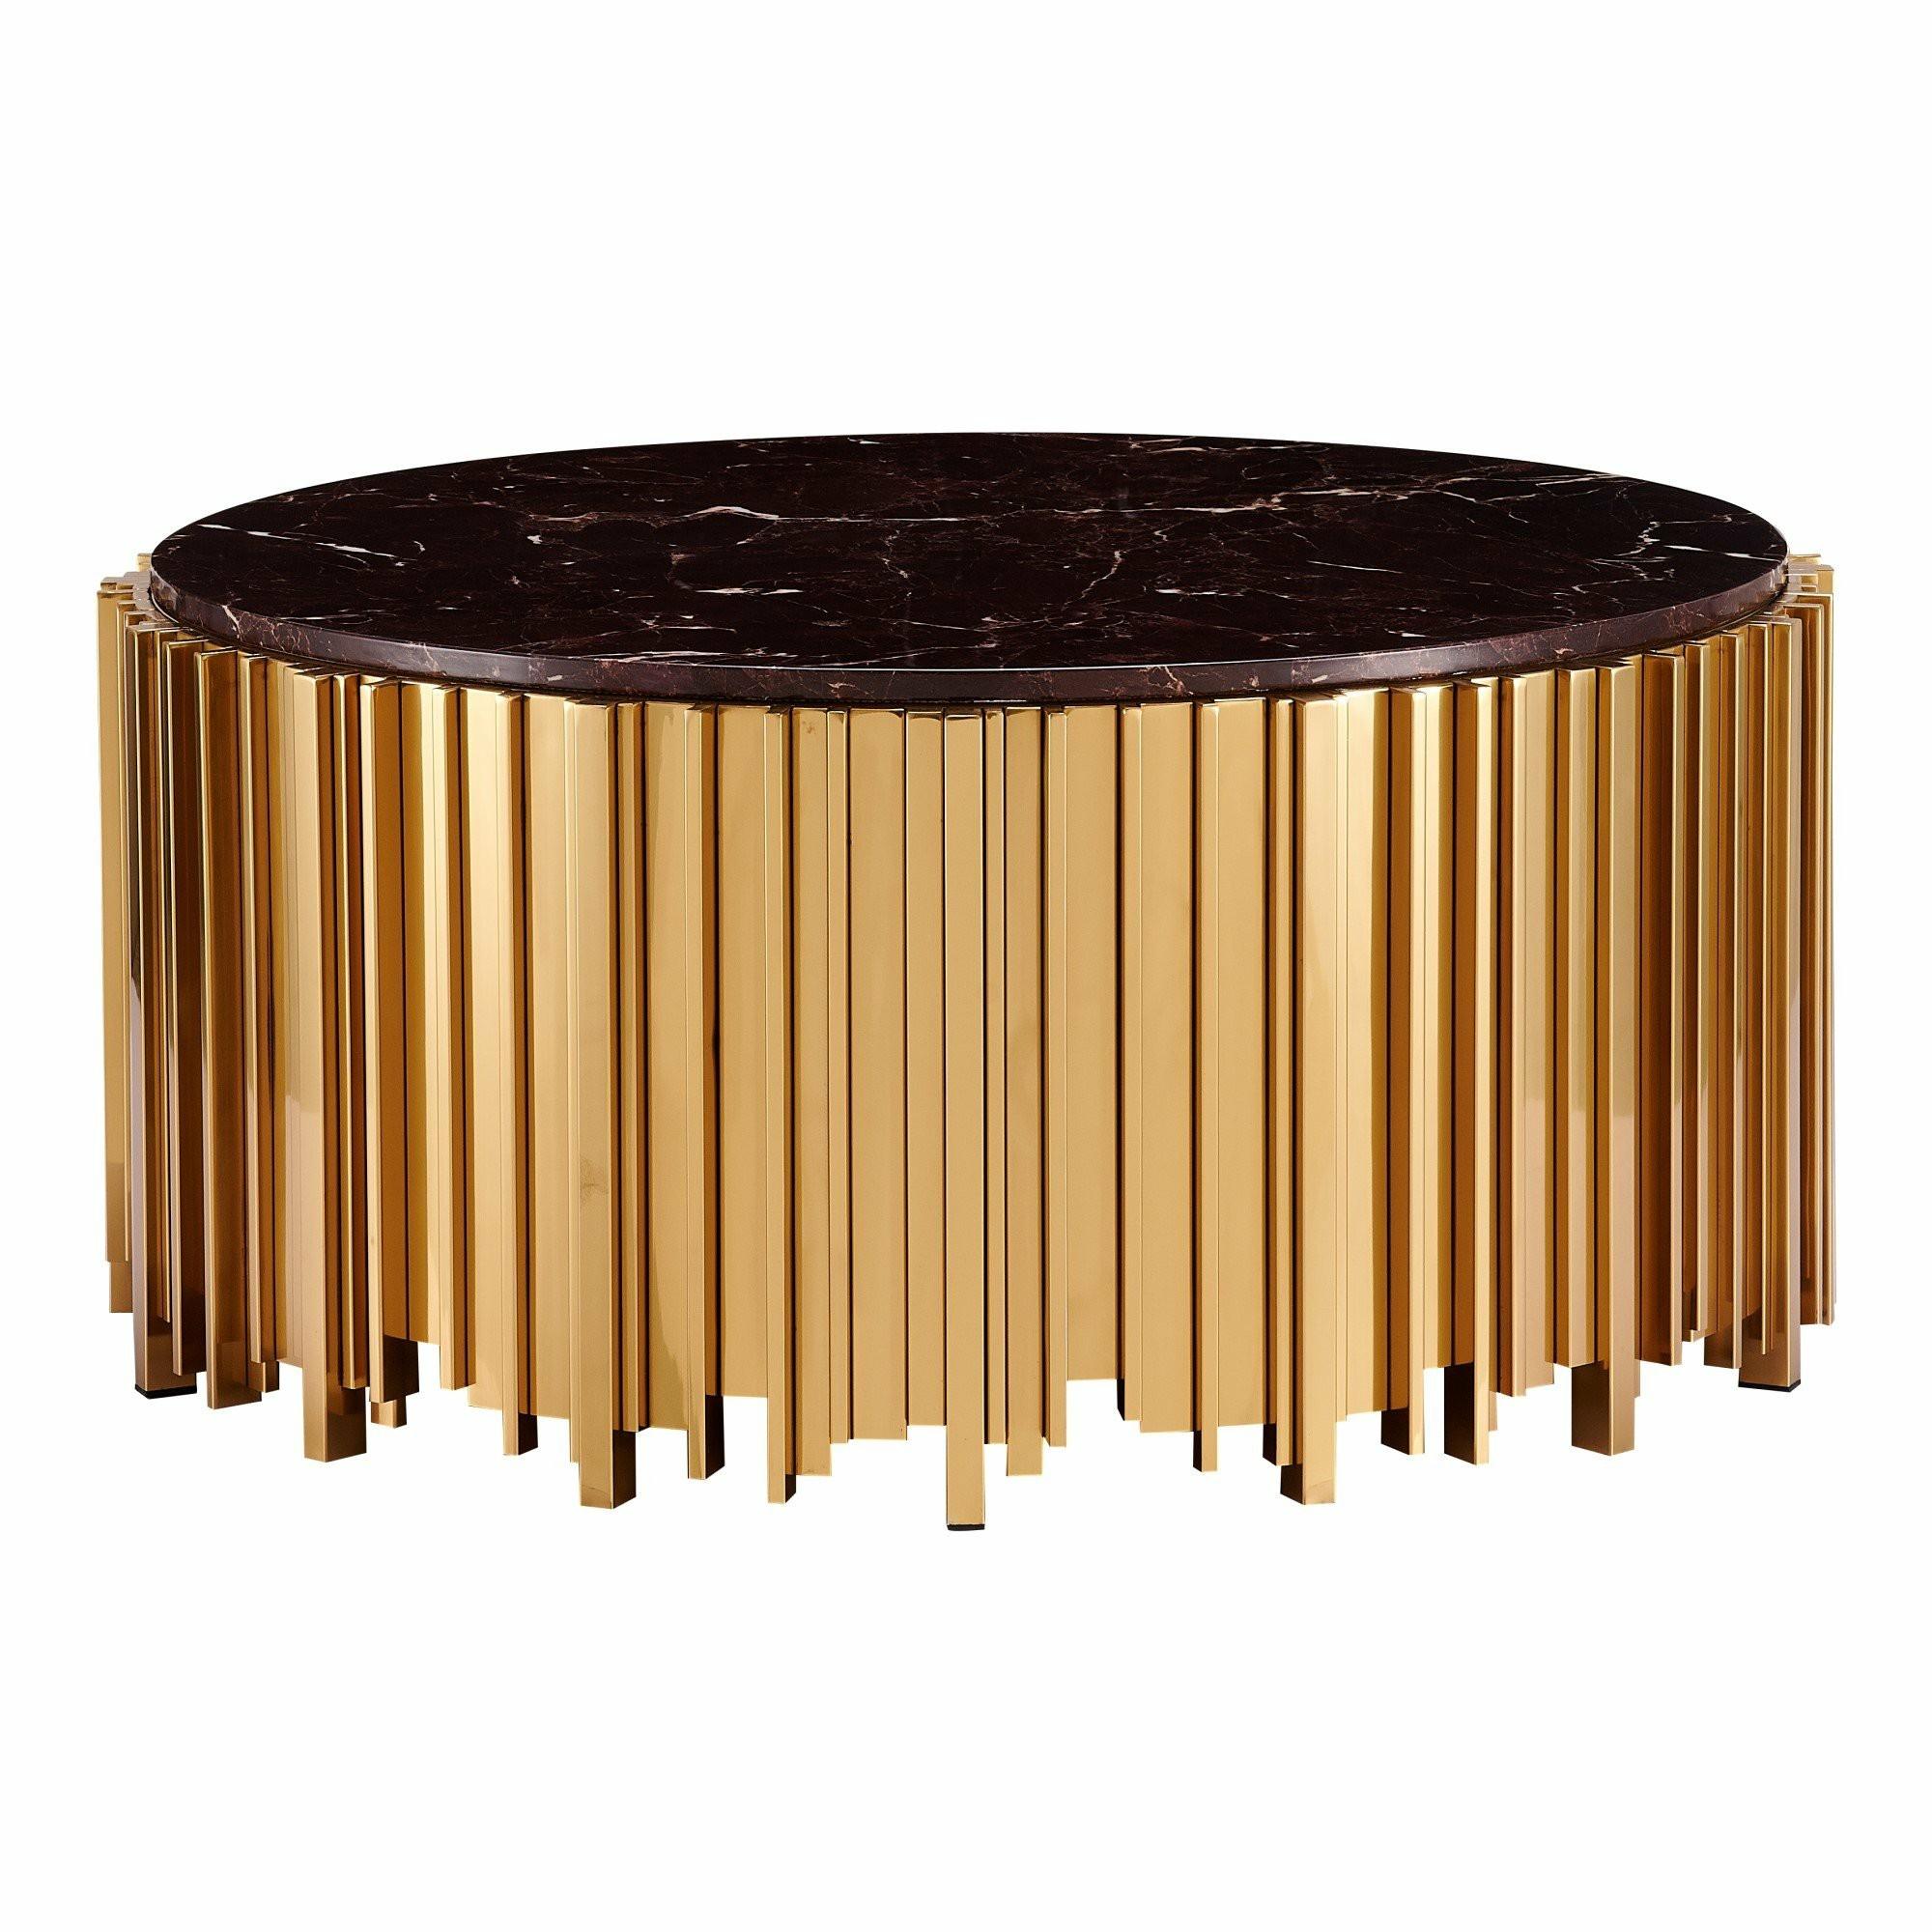 Caresi Marblite & Metal Round Coffee Table, 100cm